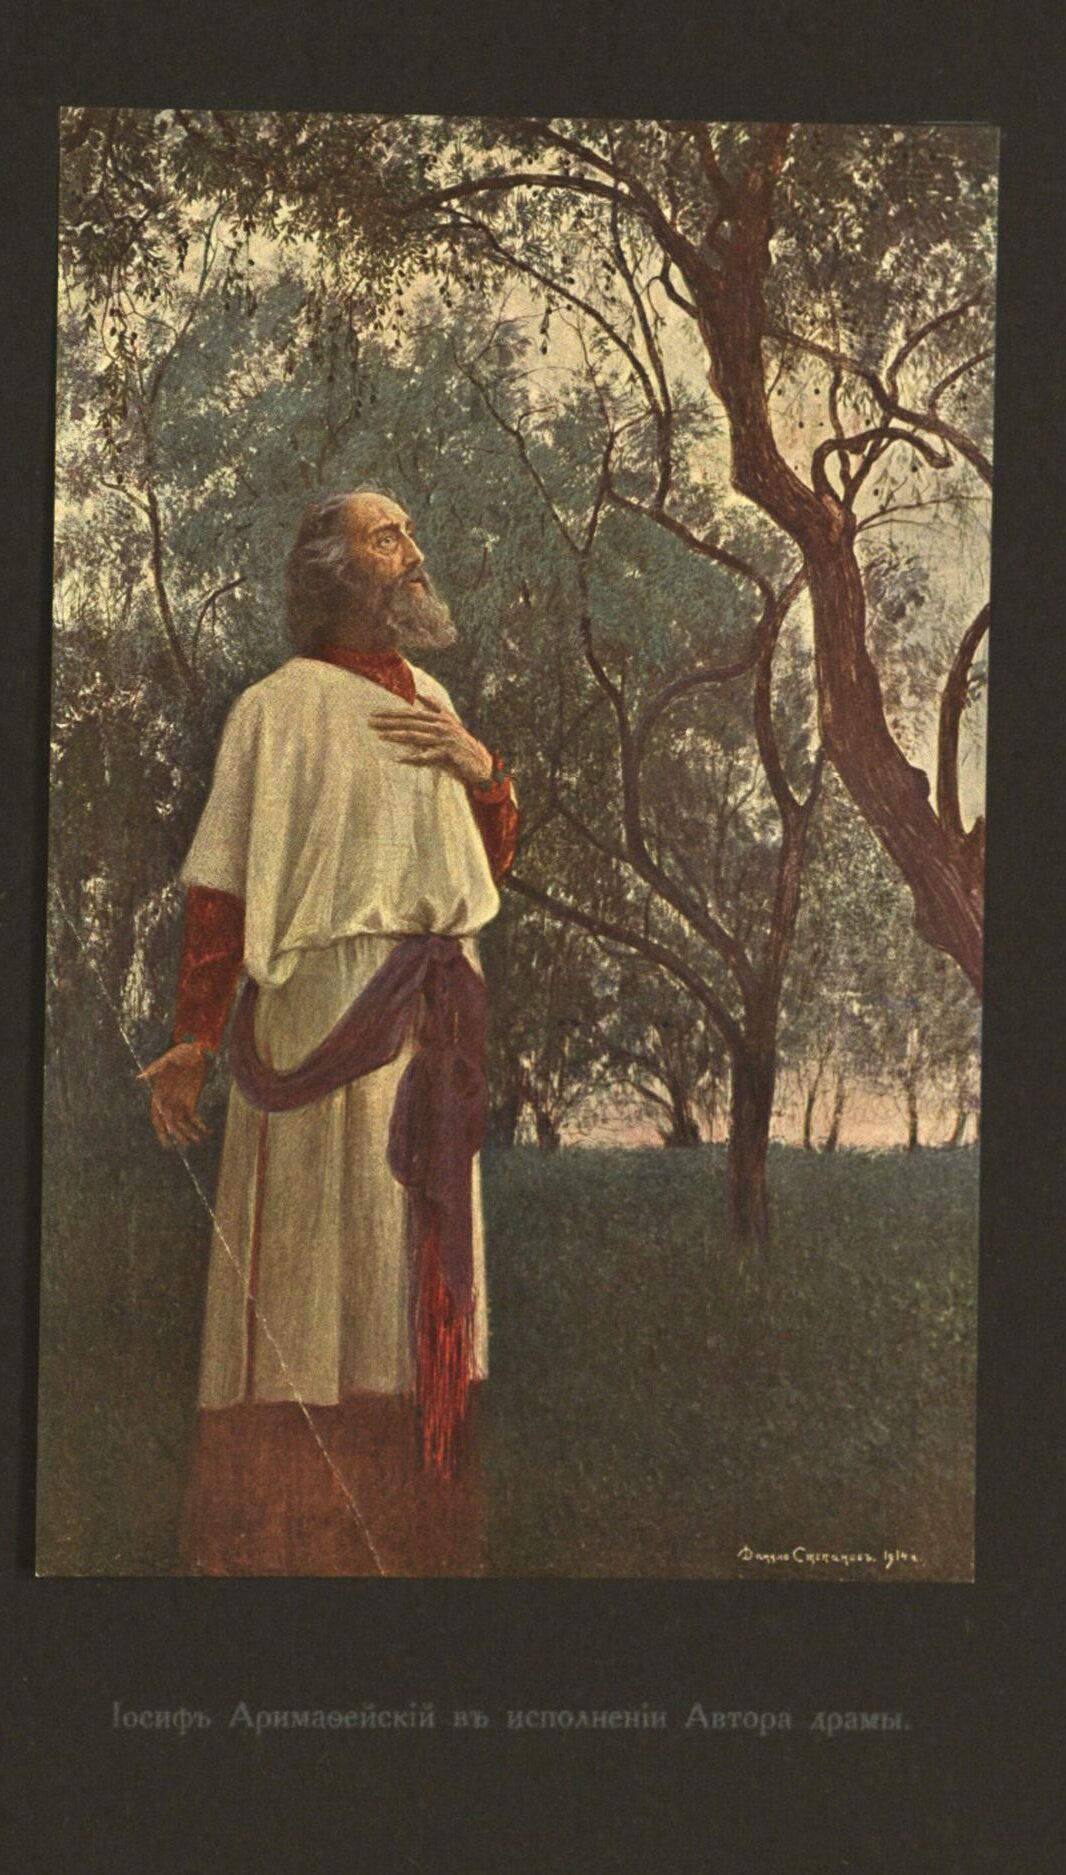 Иосиф Аримафейский в исполнении Автора драмы. Картина Даниила Степанова, 1914 г.